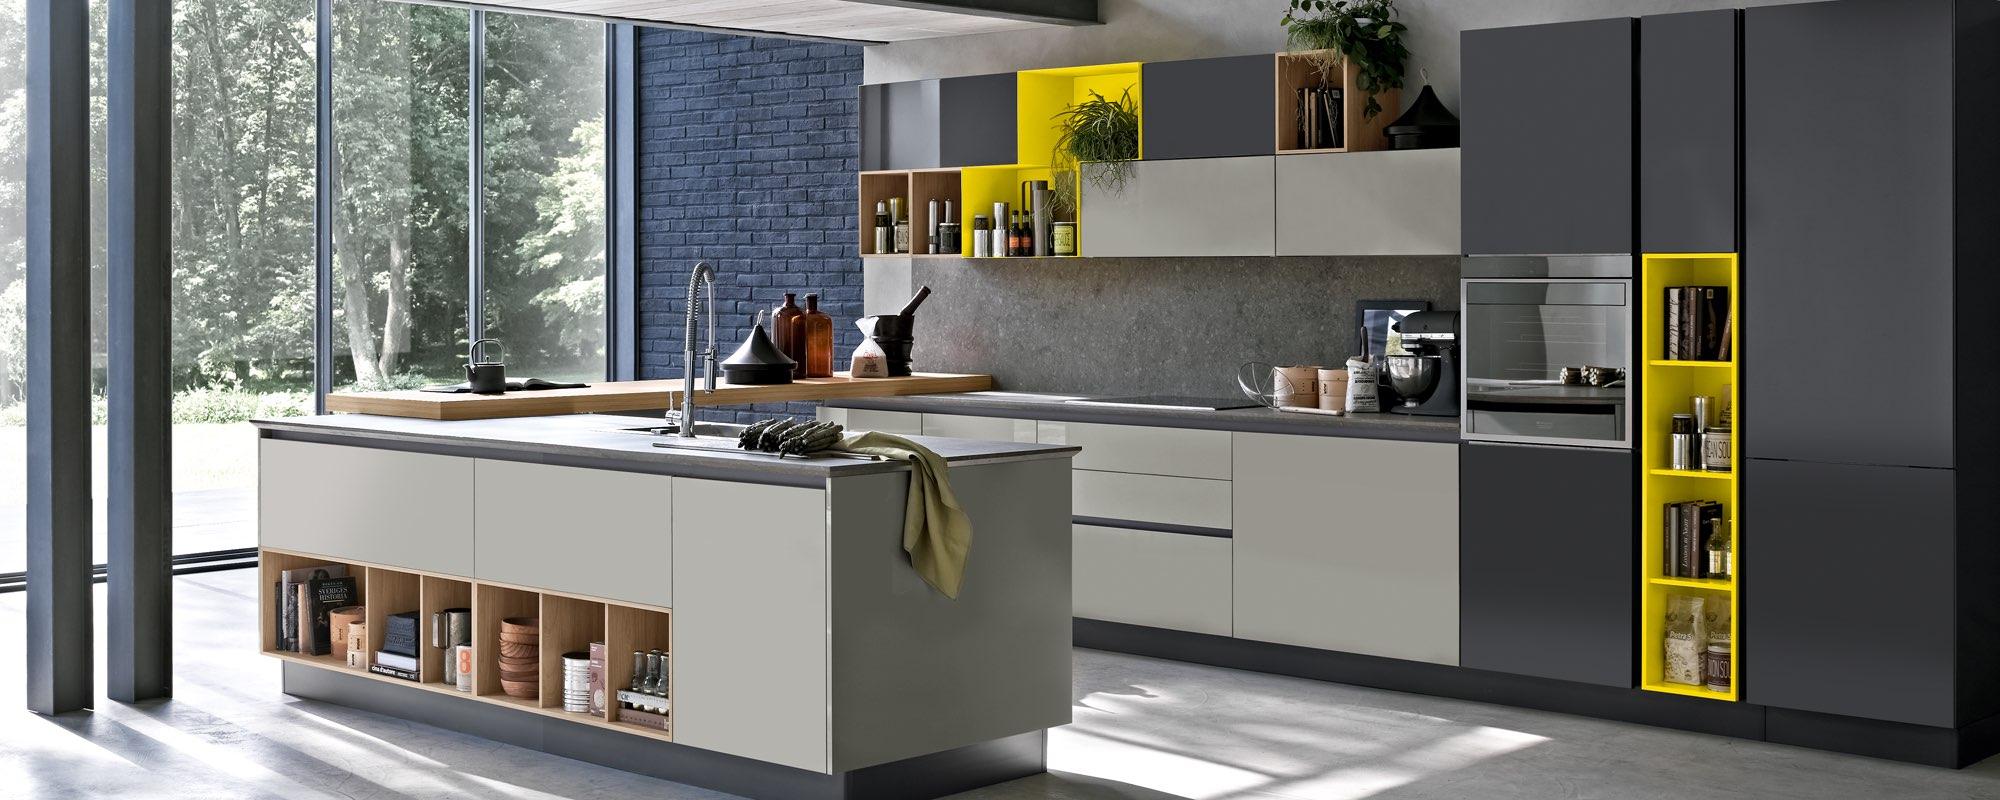 cucina moderna in legno laccata - ALEVE